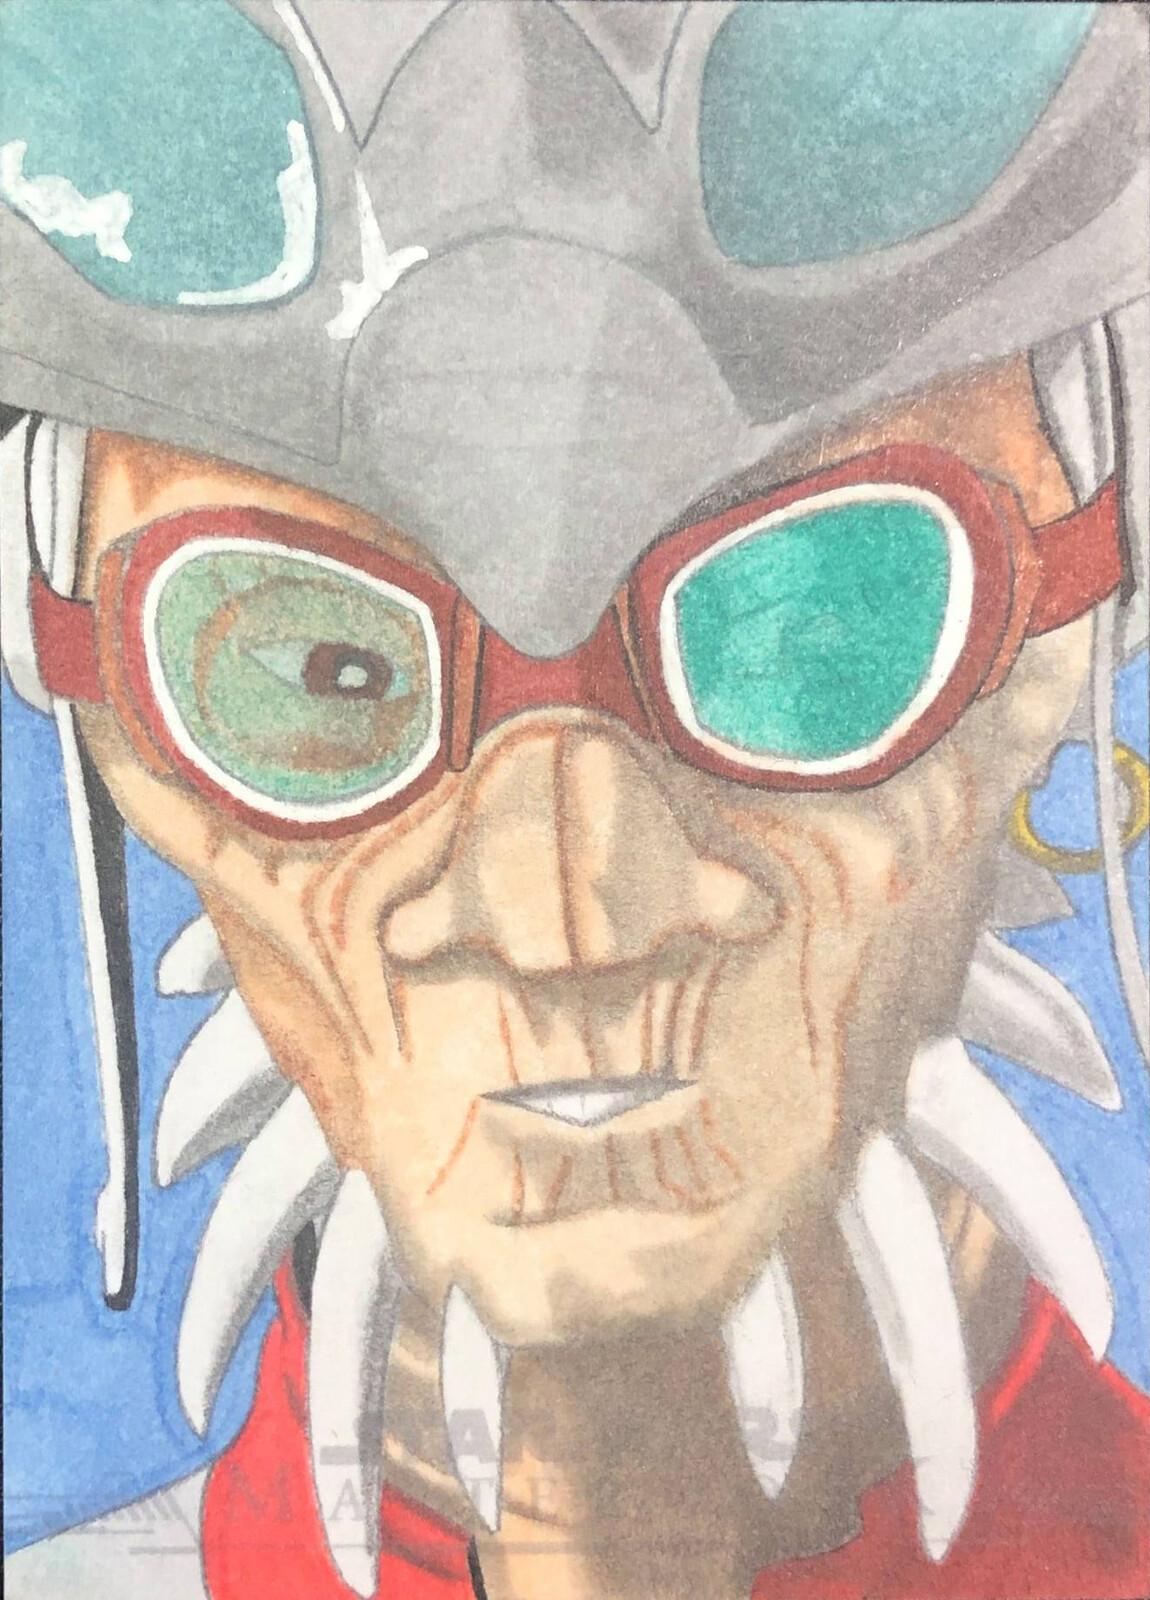 Pirate Captain Hondo